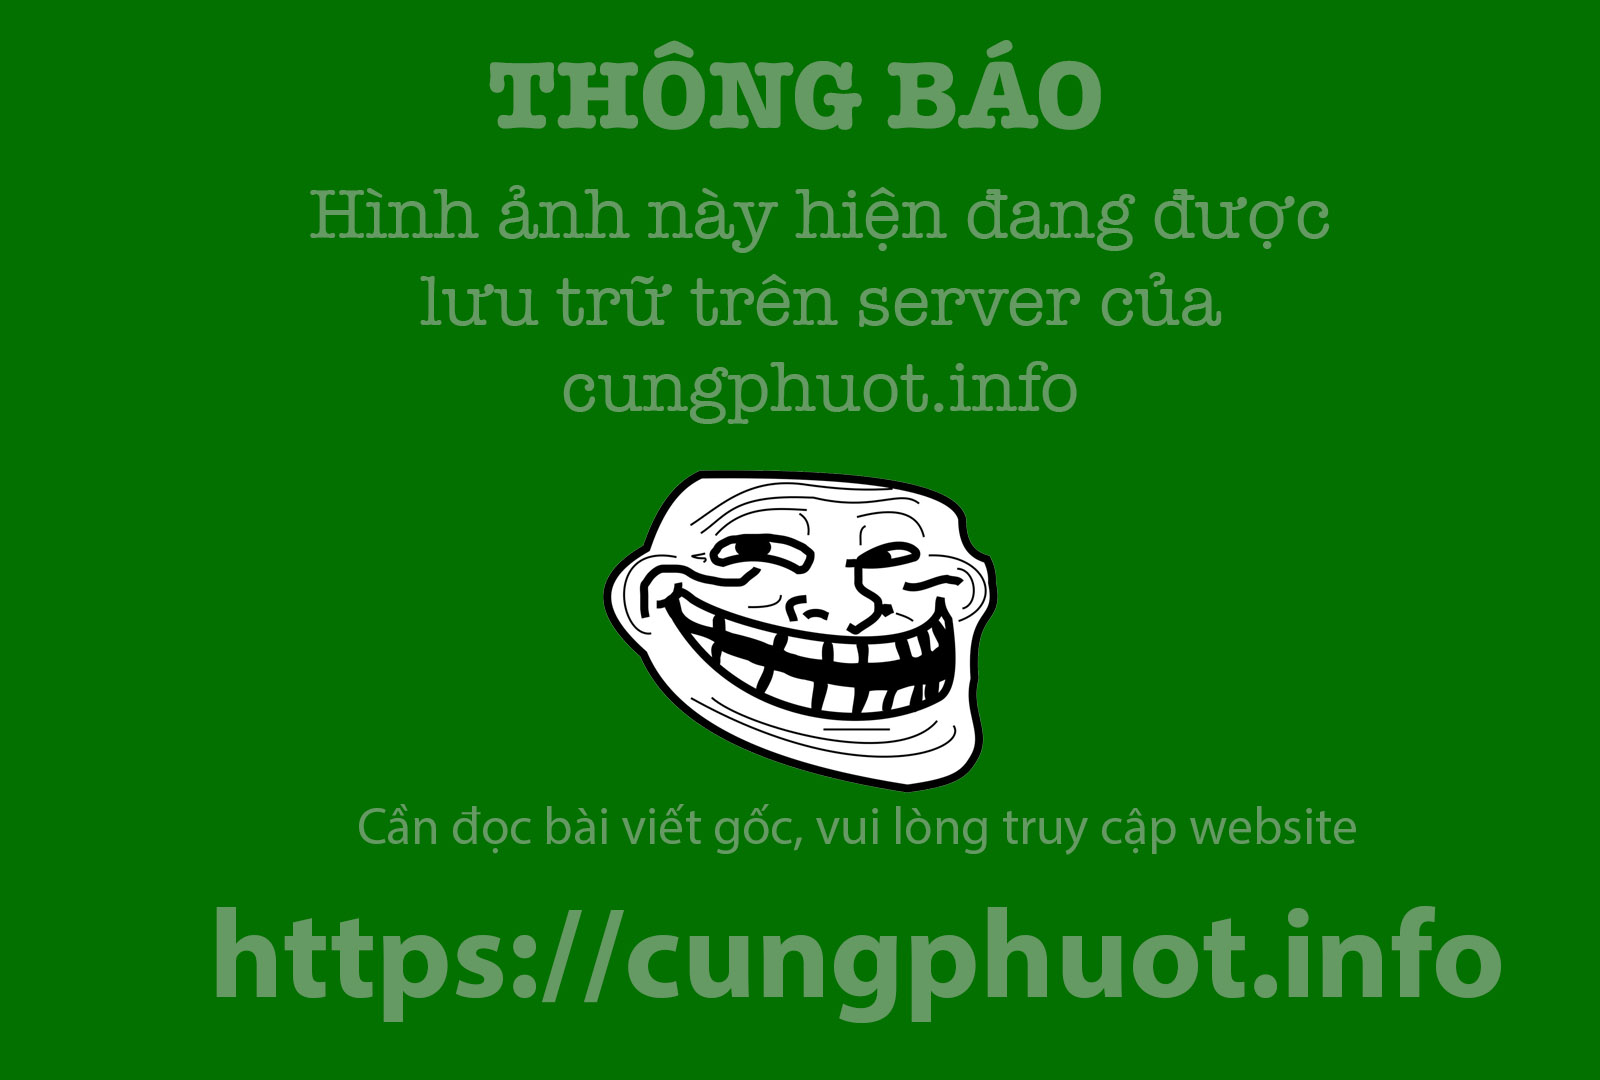 den-Trang-An-tan-mat-thay-ngoi-lang-tho-dan-trong-phim-truong-Kong-Skull-island-ivivu-2